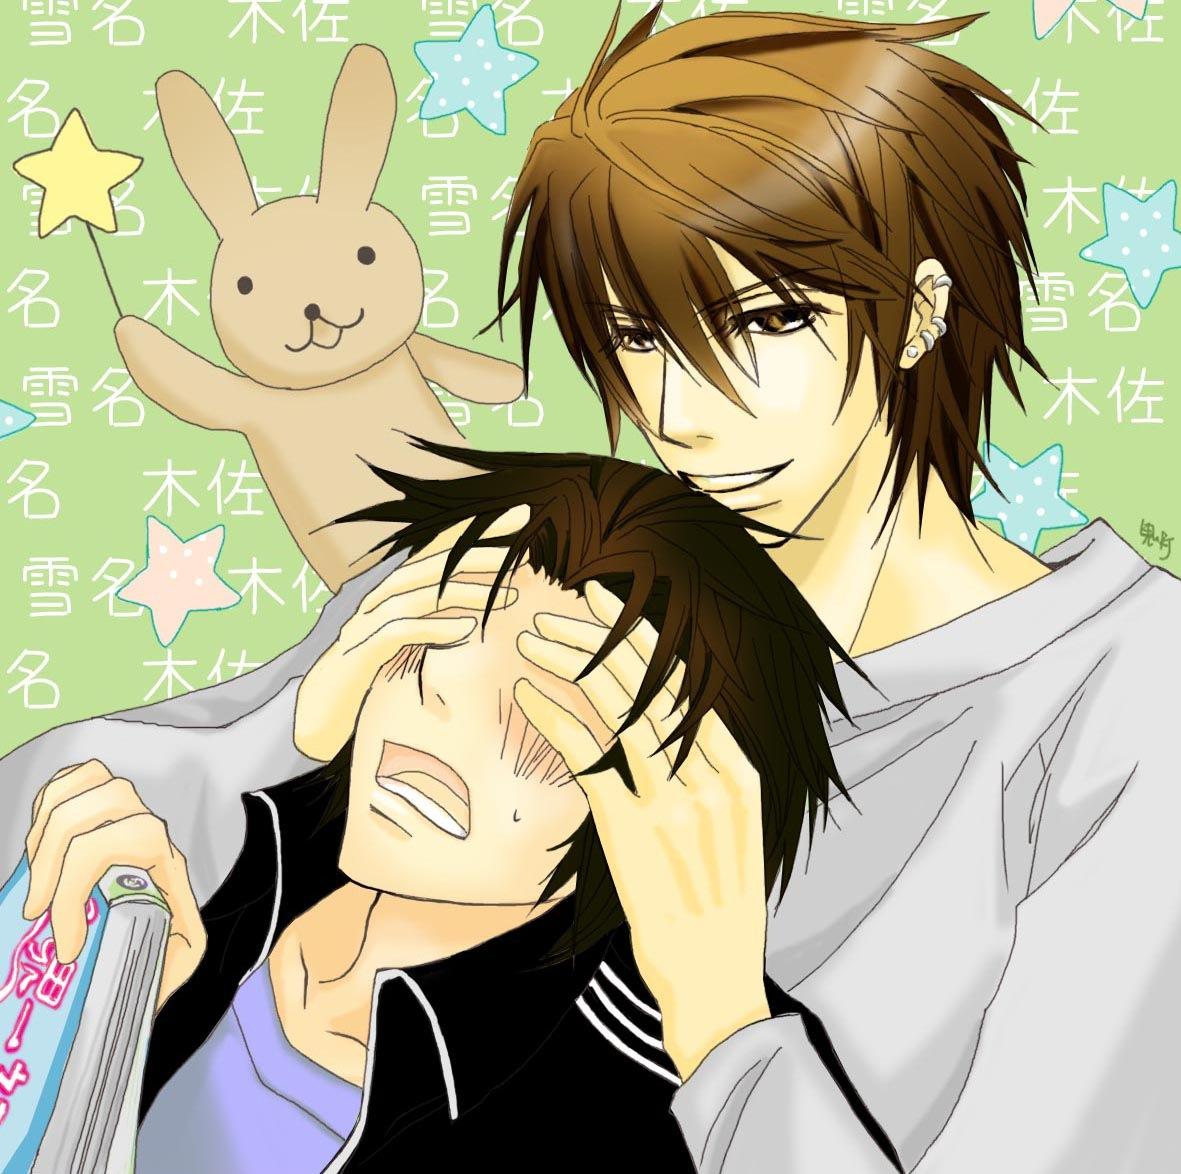 Sekai Ichi Hatsukoi World S First Love Nakamura Shungiku Image 667319 Zerochan Anime Image Board